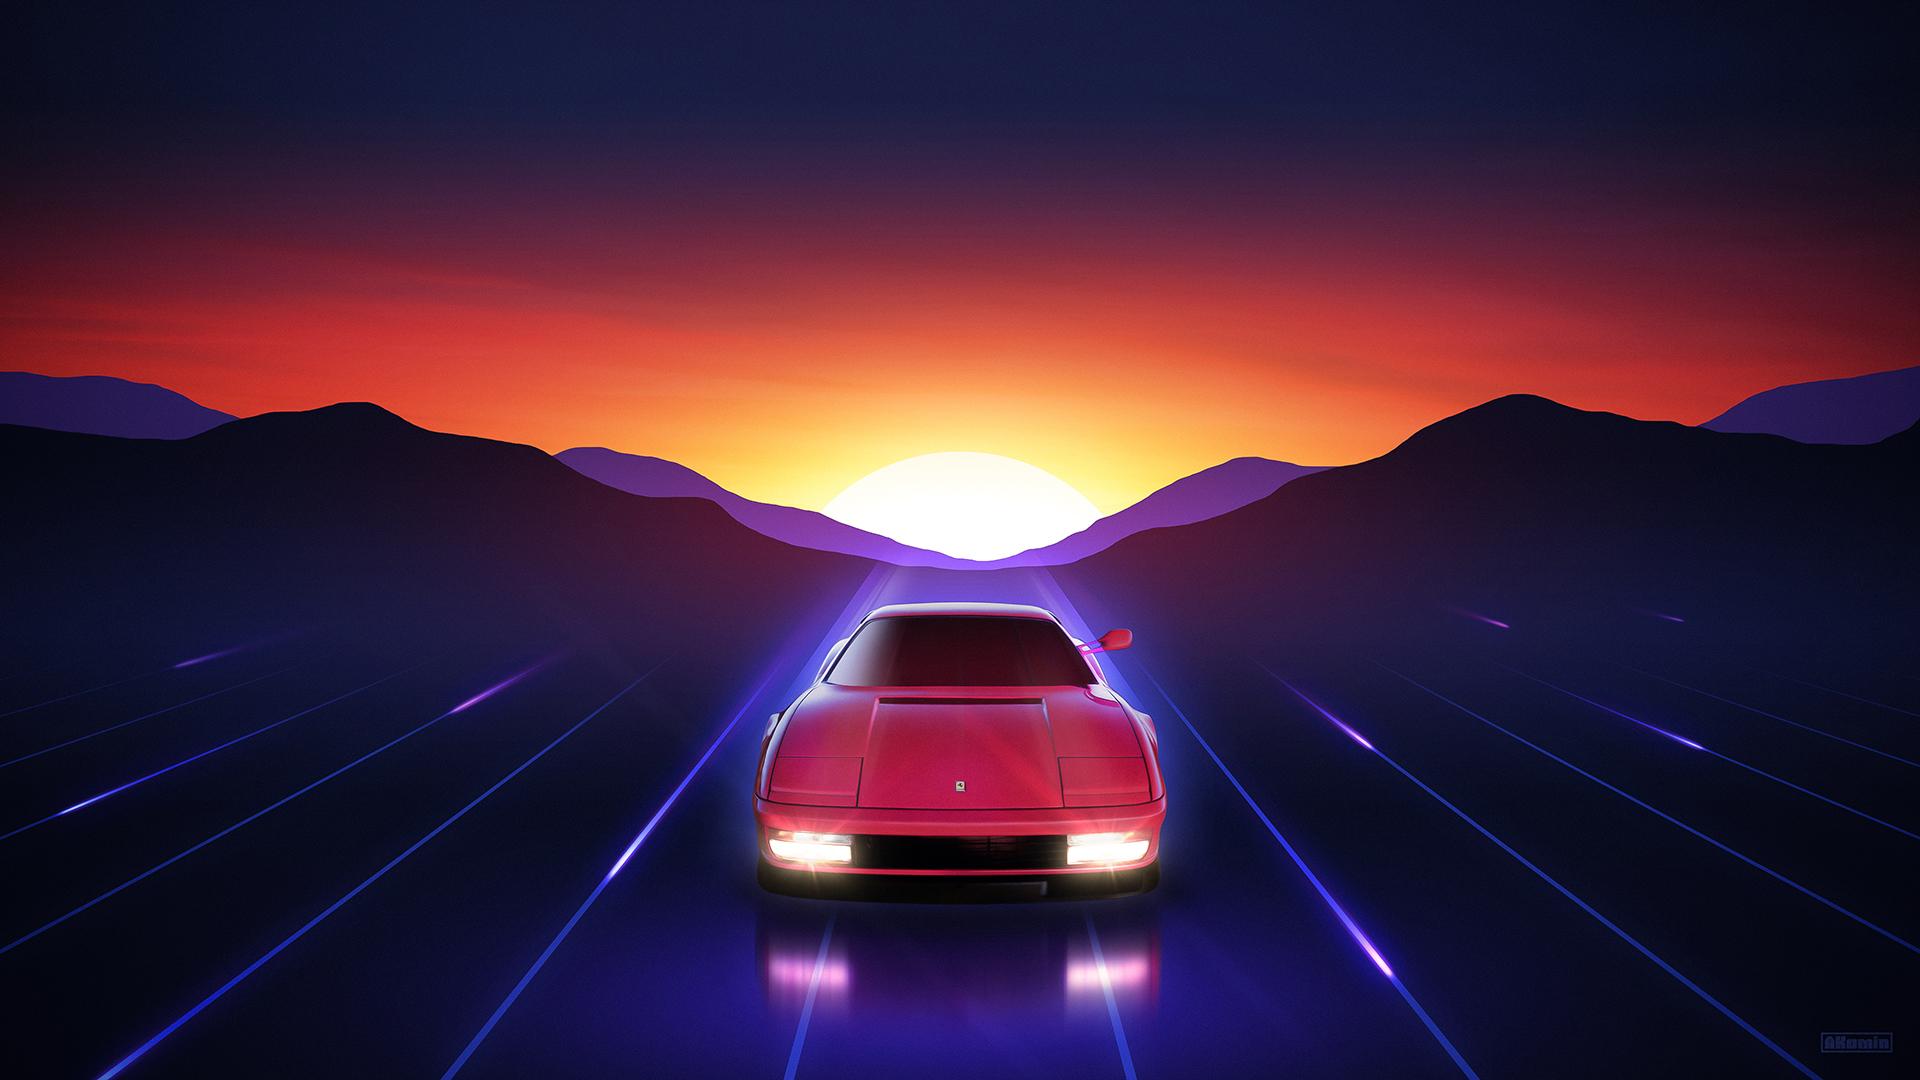 2560x1600 Ferrari Testarossa Sunrise 2560x1600 Resolution Wallpaper Hd Artist 4k Wallpapers Images Photos And Background